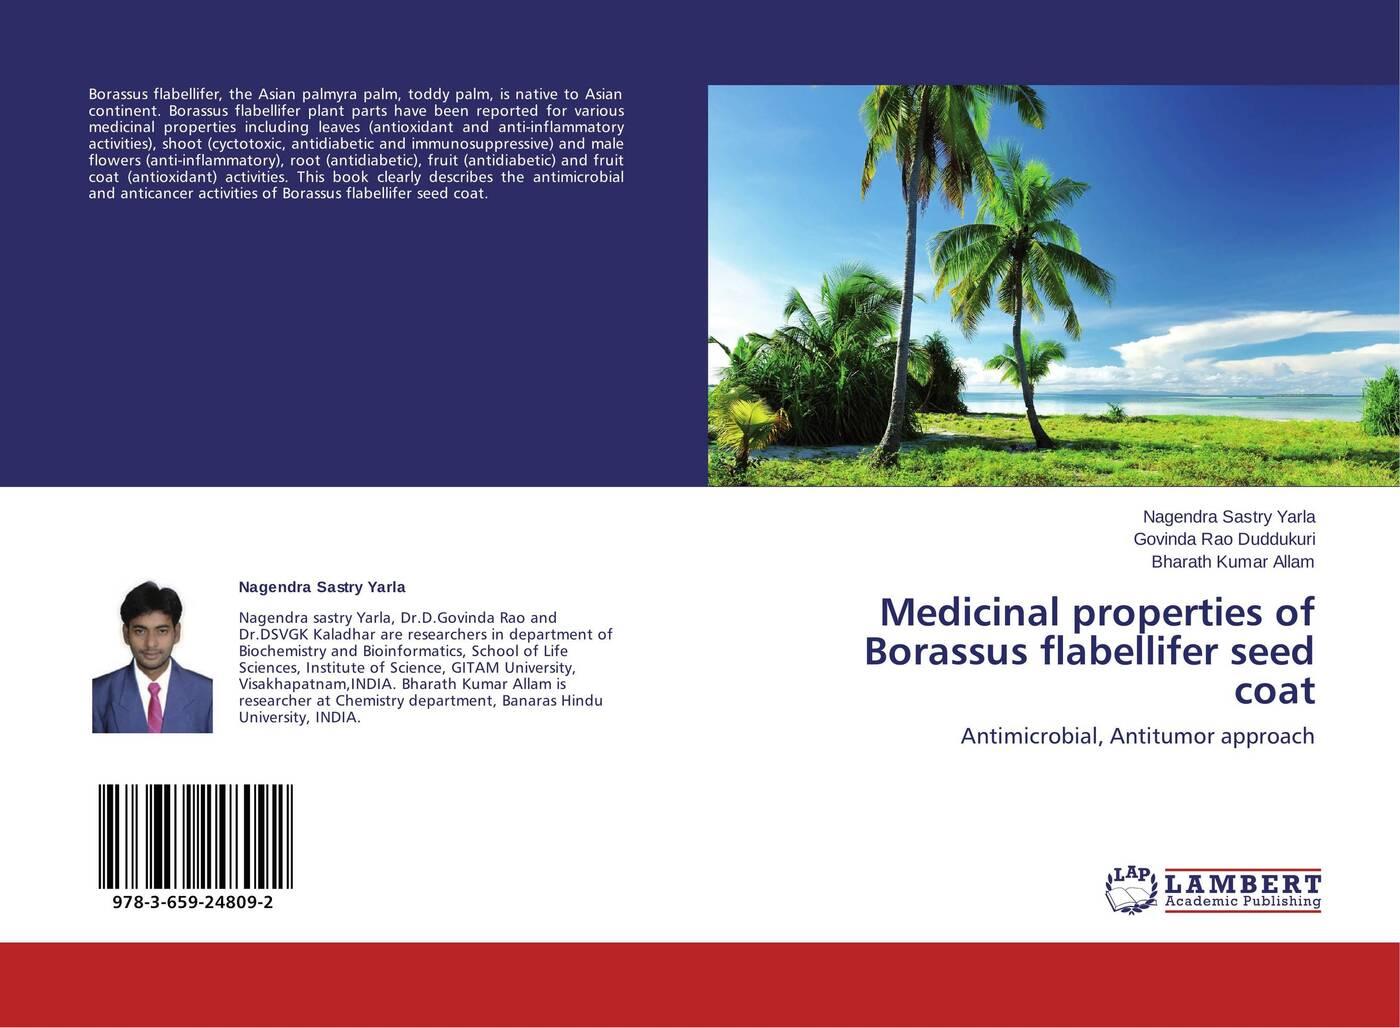 Nagendra Sastry Yarla,Govinda Rao Duddukuri and Bharath Kumar Allam Medicinal properties of Borassus flabellifer seed coat showkat ganie and shajr ul amin antioxidant